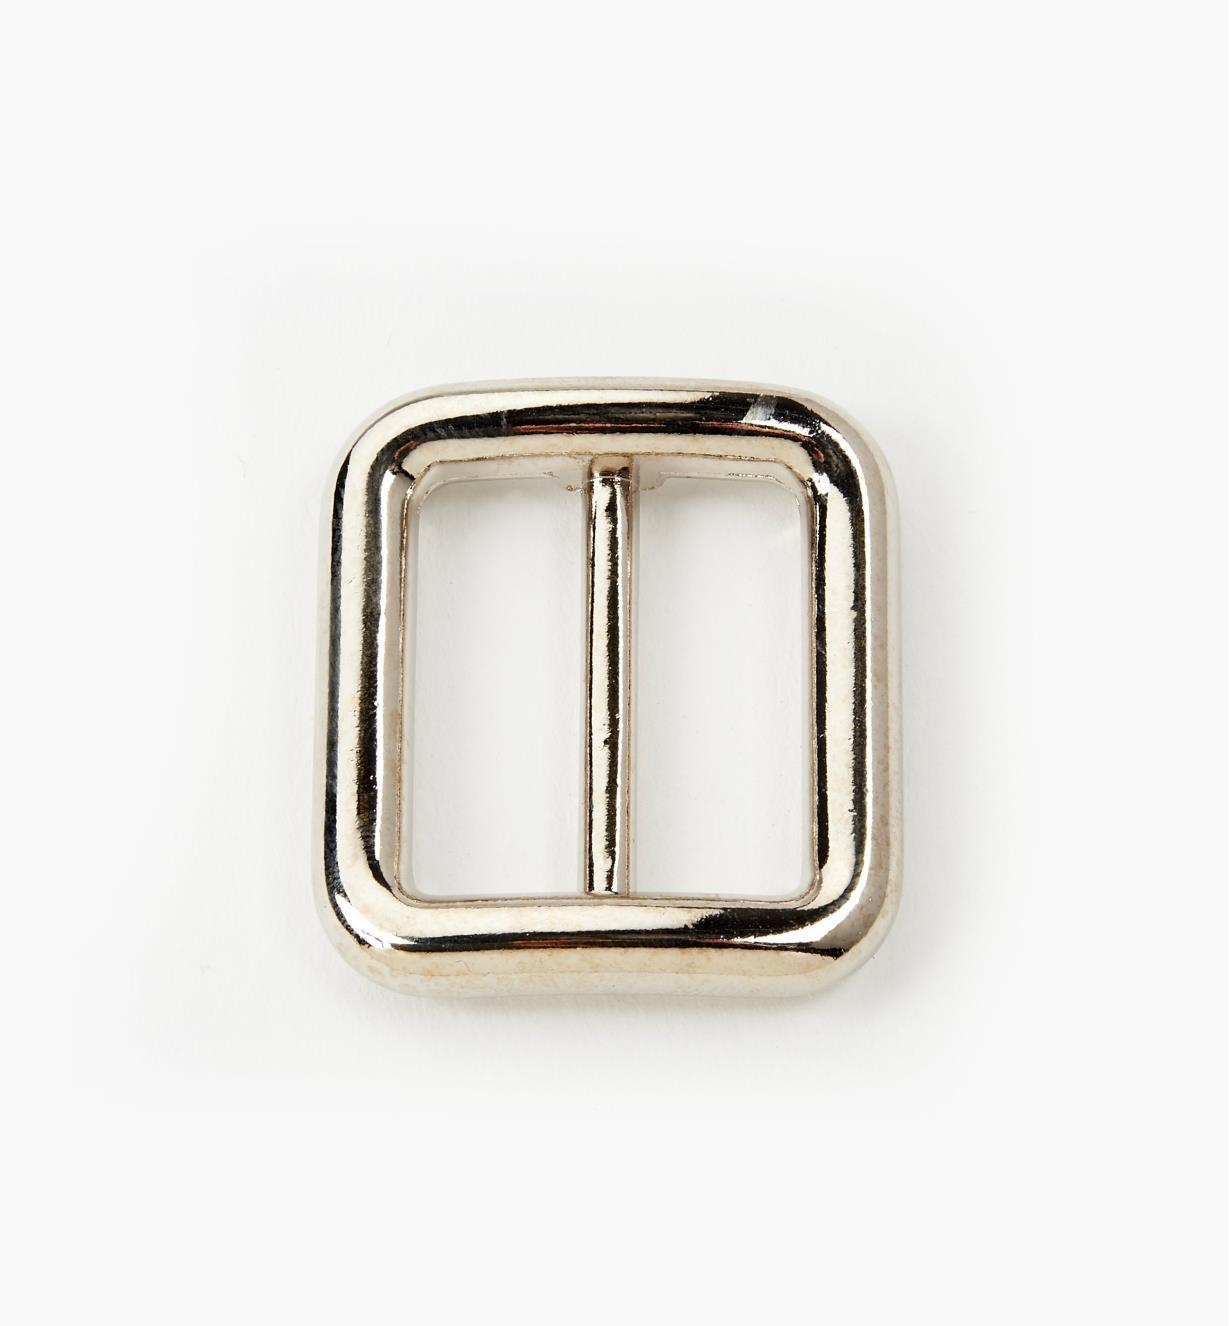 91Z5161 - ABC Morini 25mm x 22mm Nickel Plate Strap Keeper